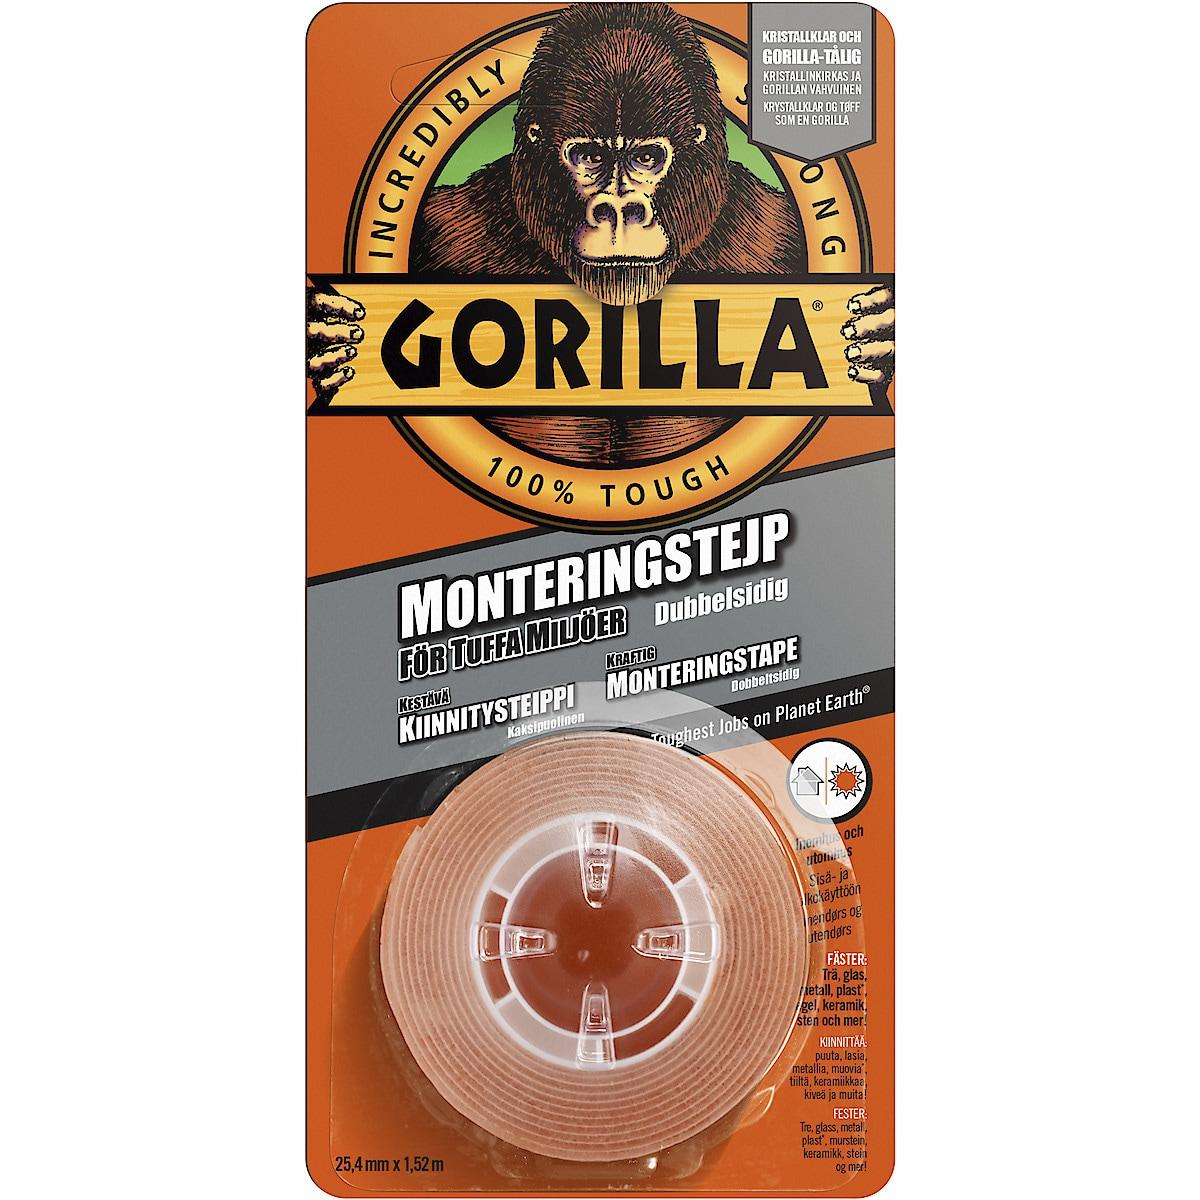 Monteringstejp Gorilla